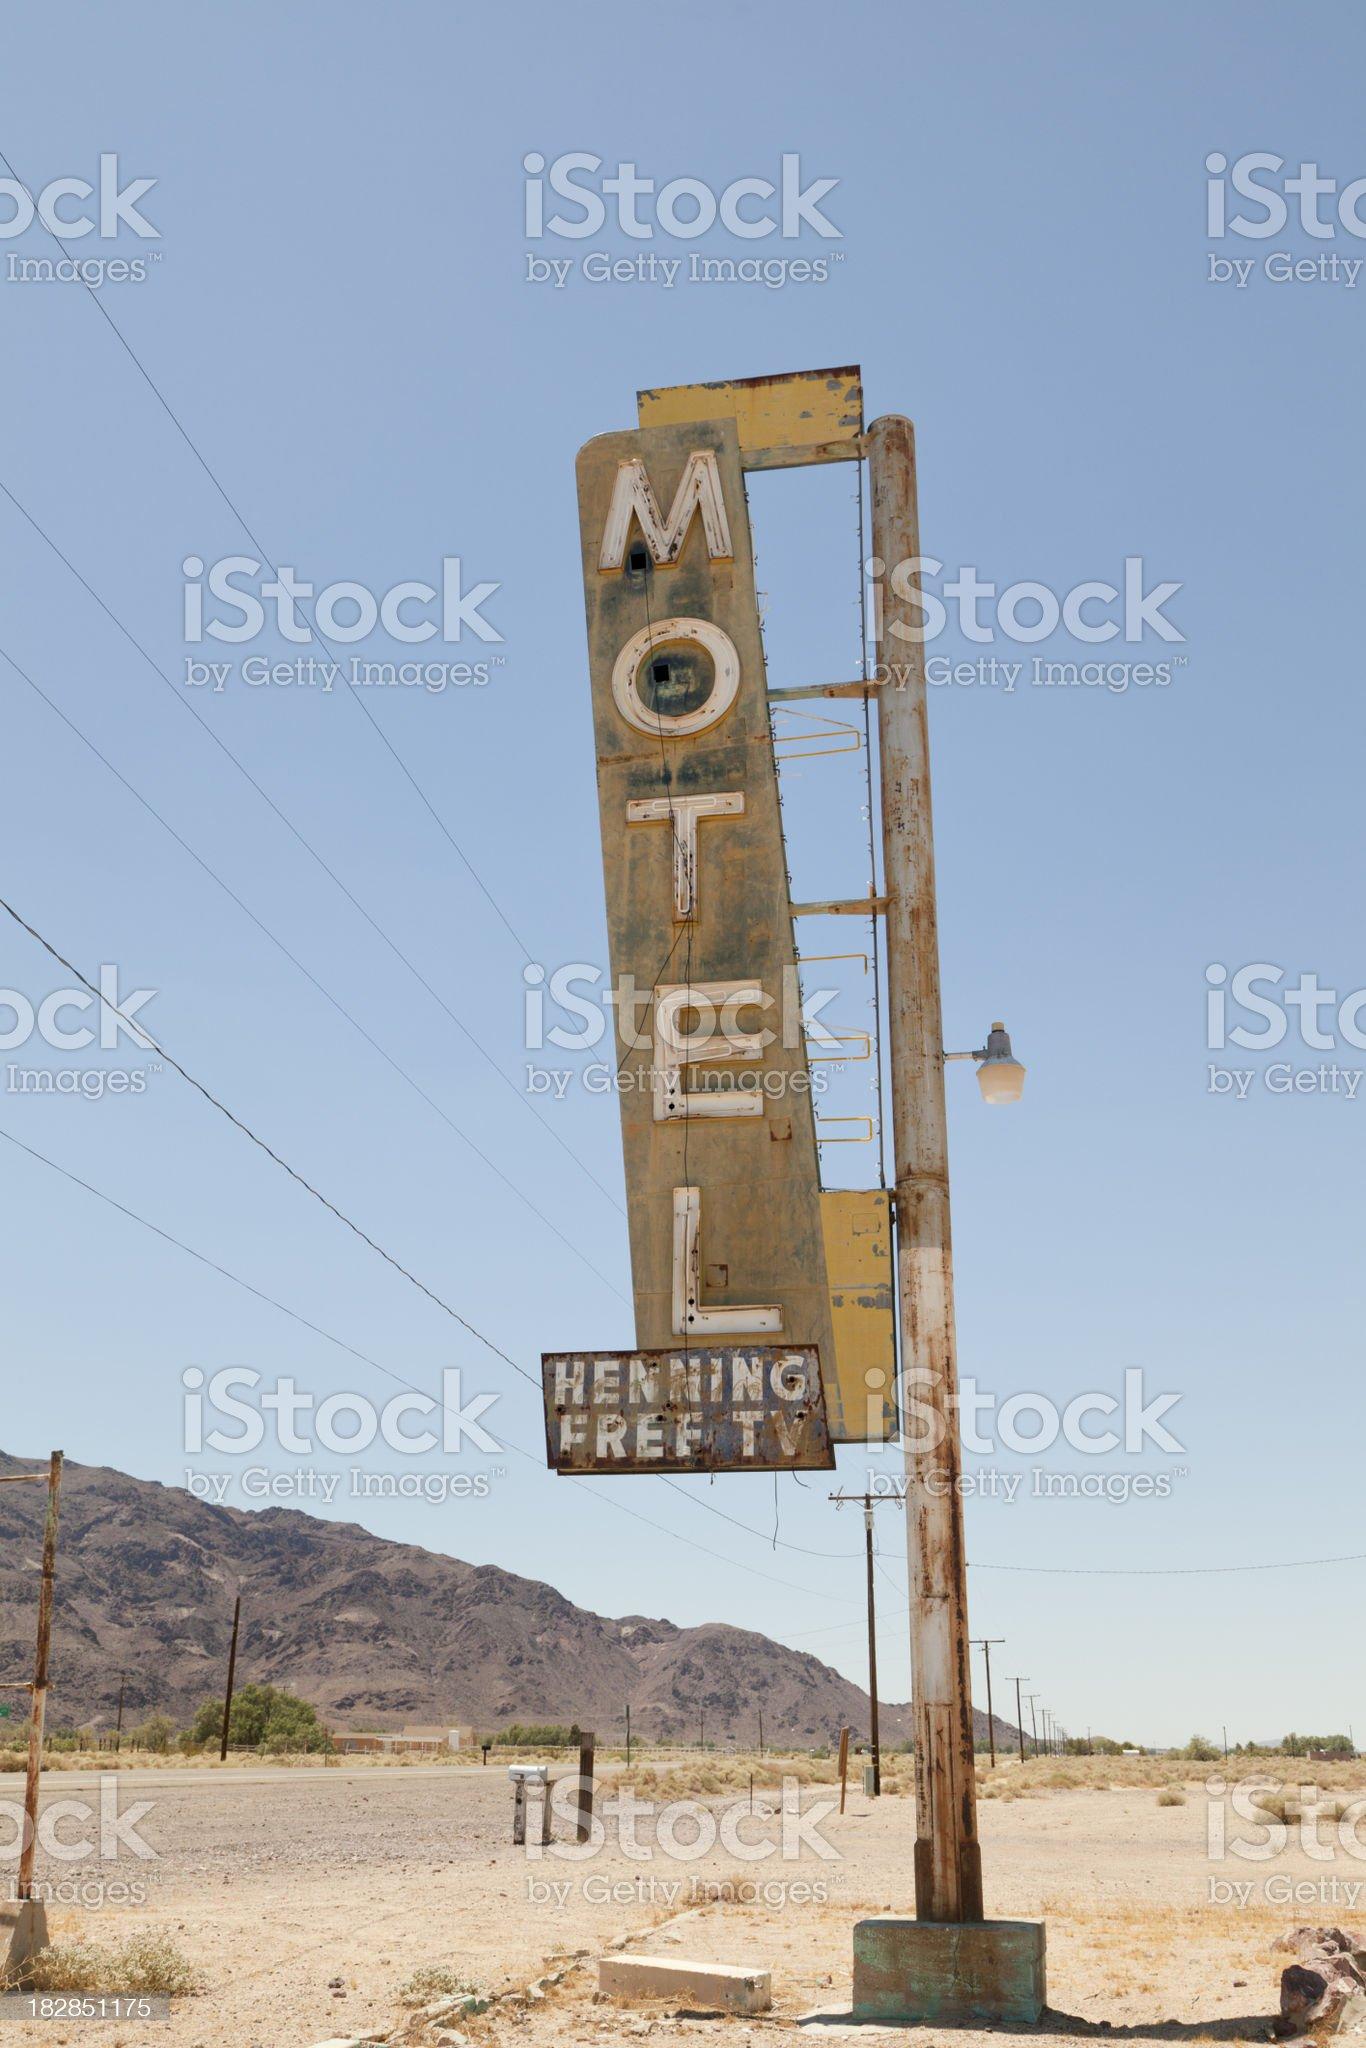 Motel Sign on Route 66, Desert royalty-free stock photo